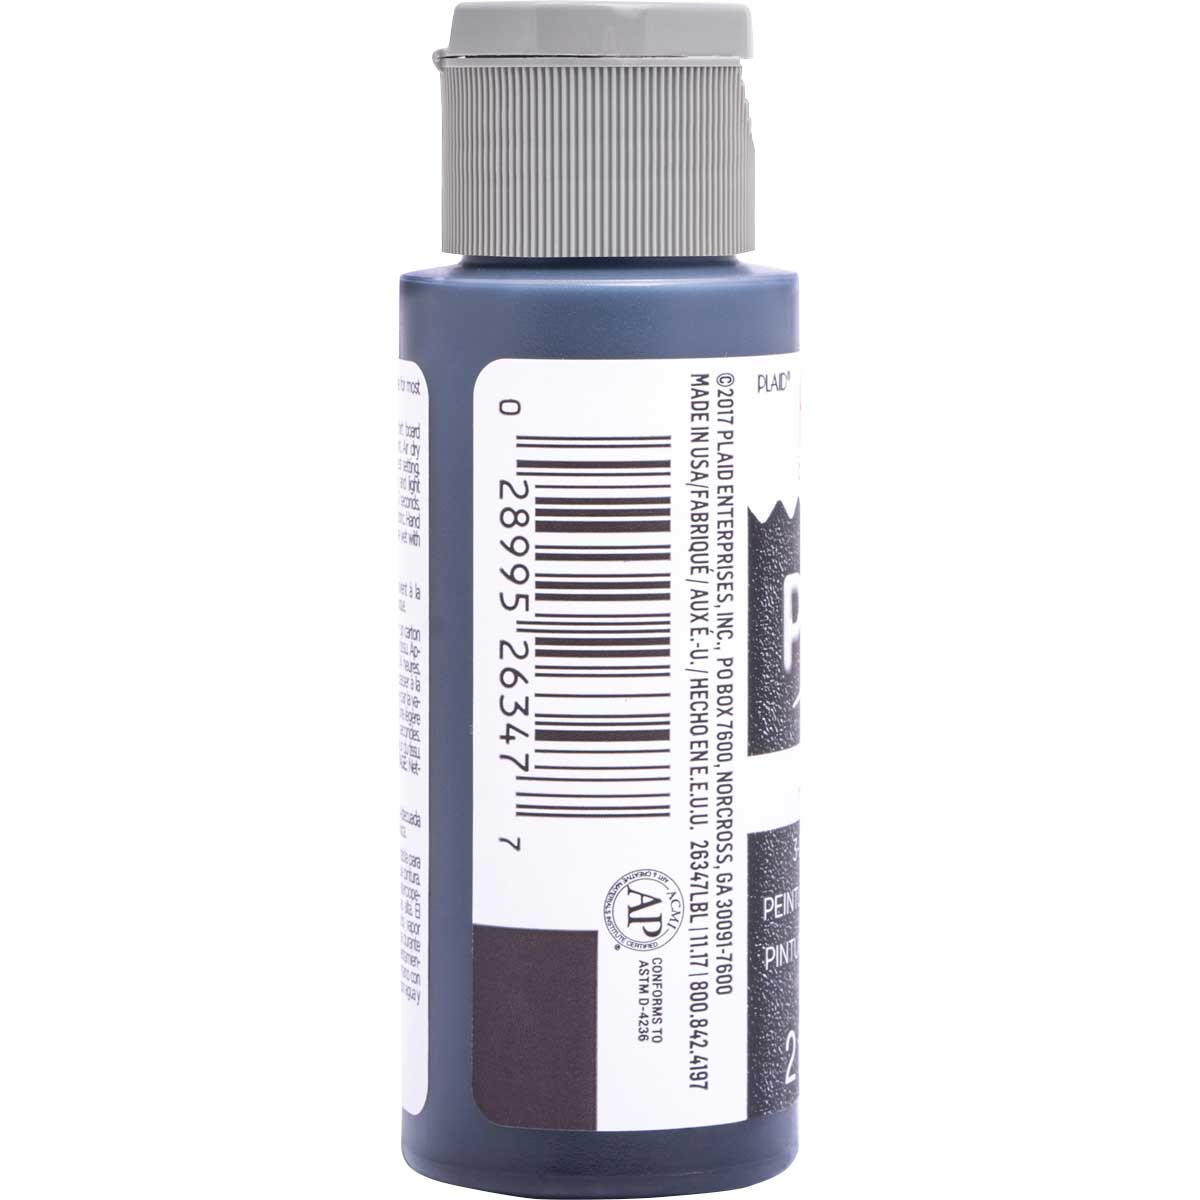 Fabric Creations™ Plush™ 3-D Fabric Paints - Licorice, 2 oz.